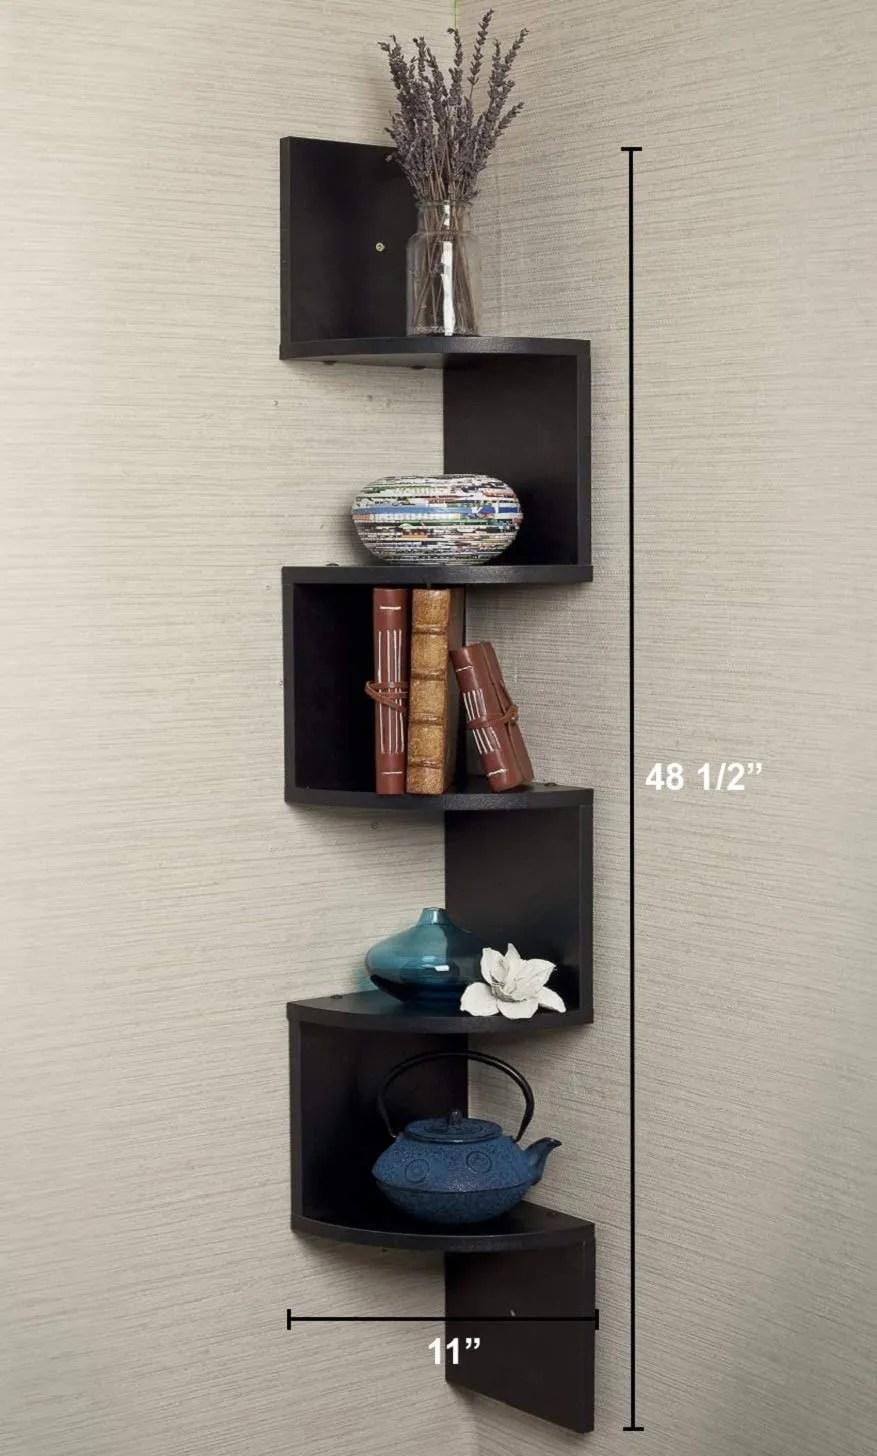 Wall Mount Corner - home office decor ideas